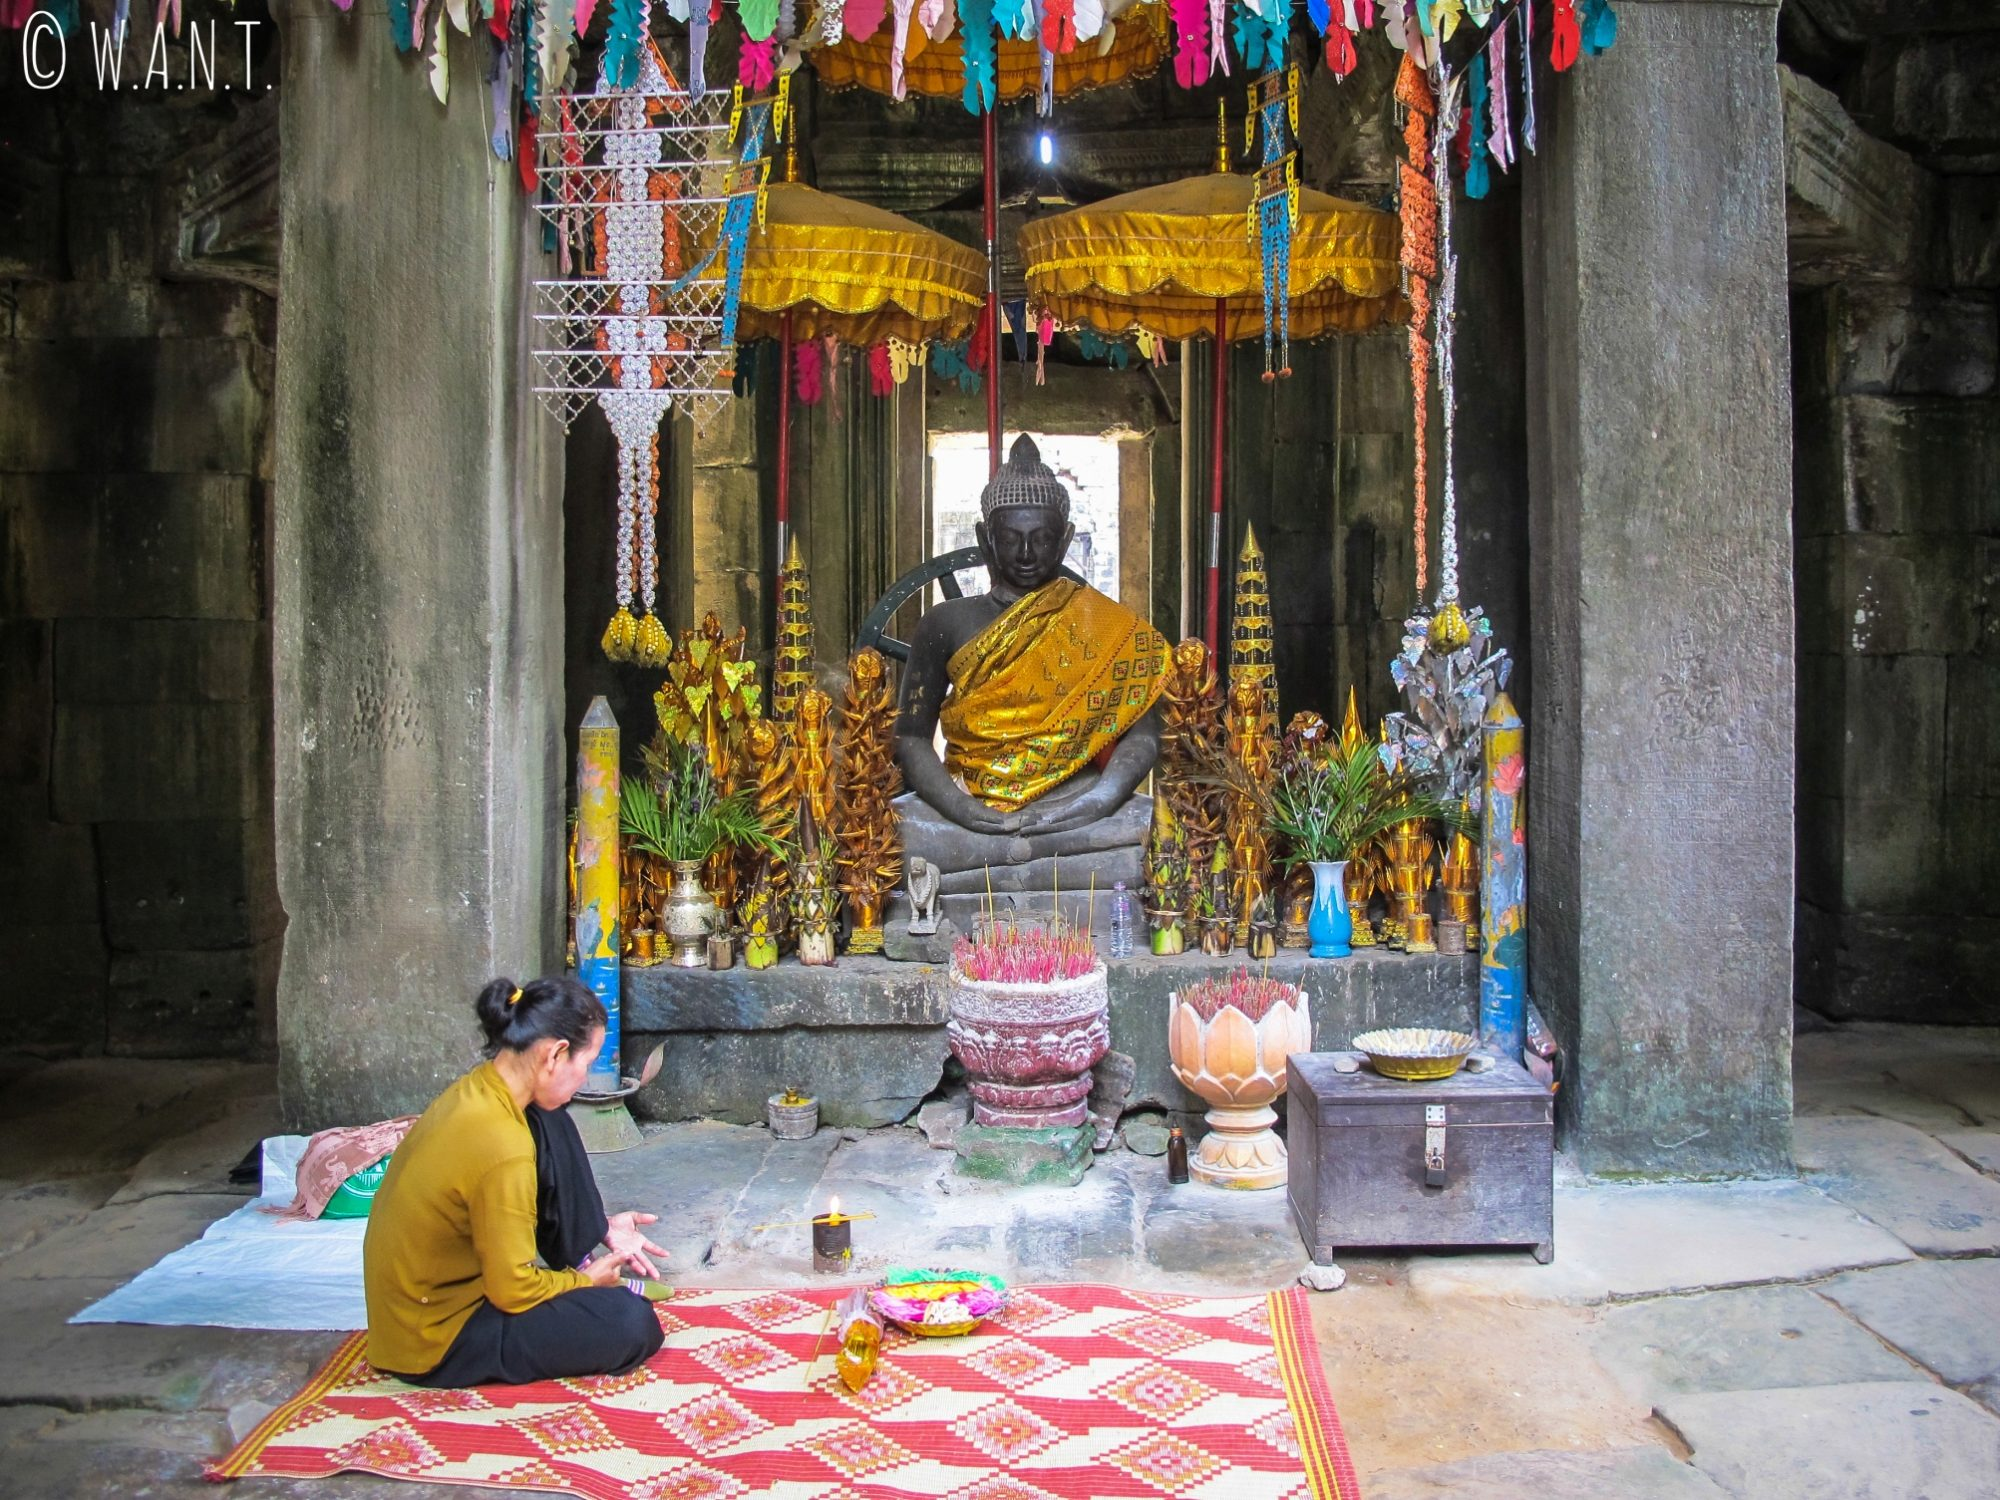 Statue de Bouddha au temple Banteay Kdei d'Angkor